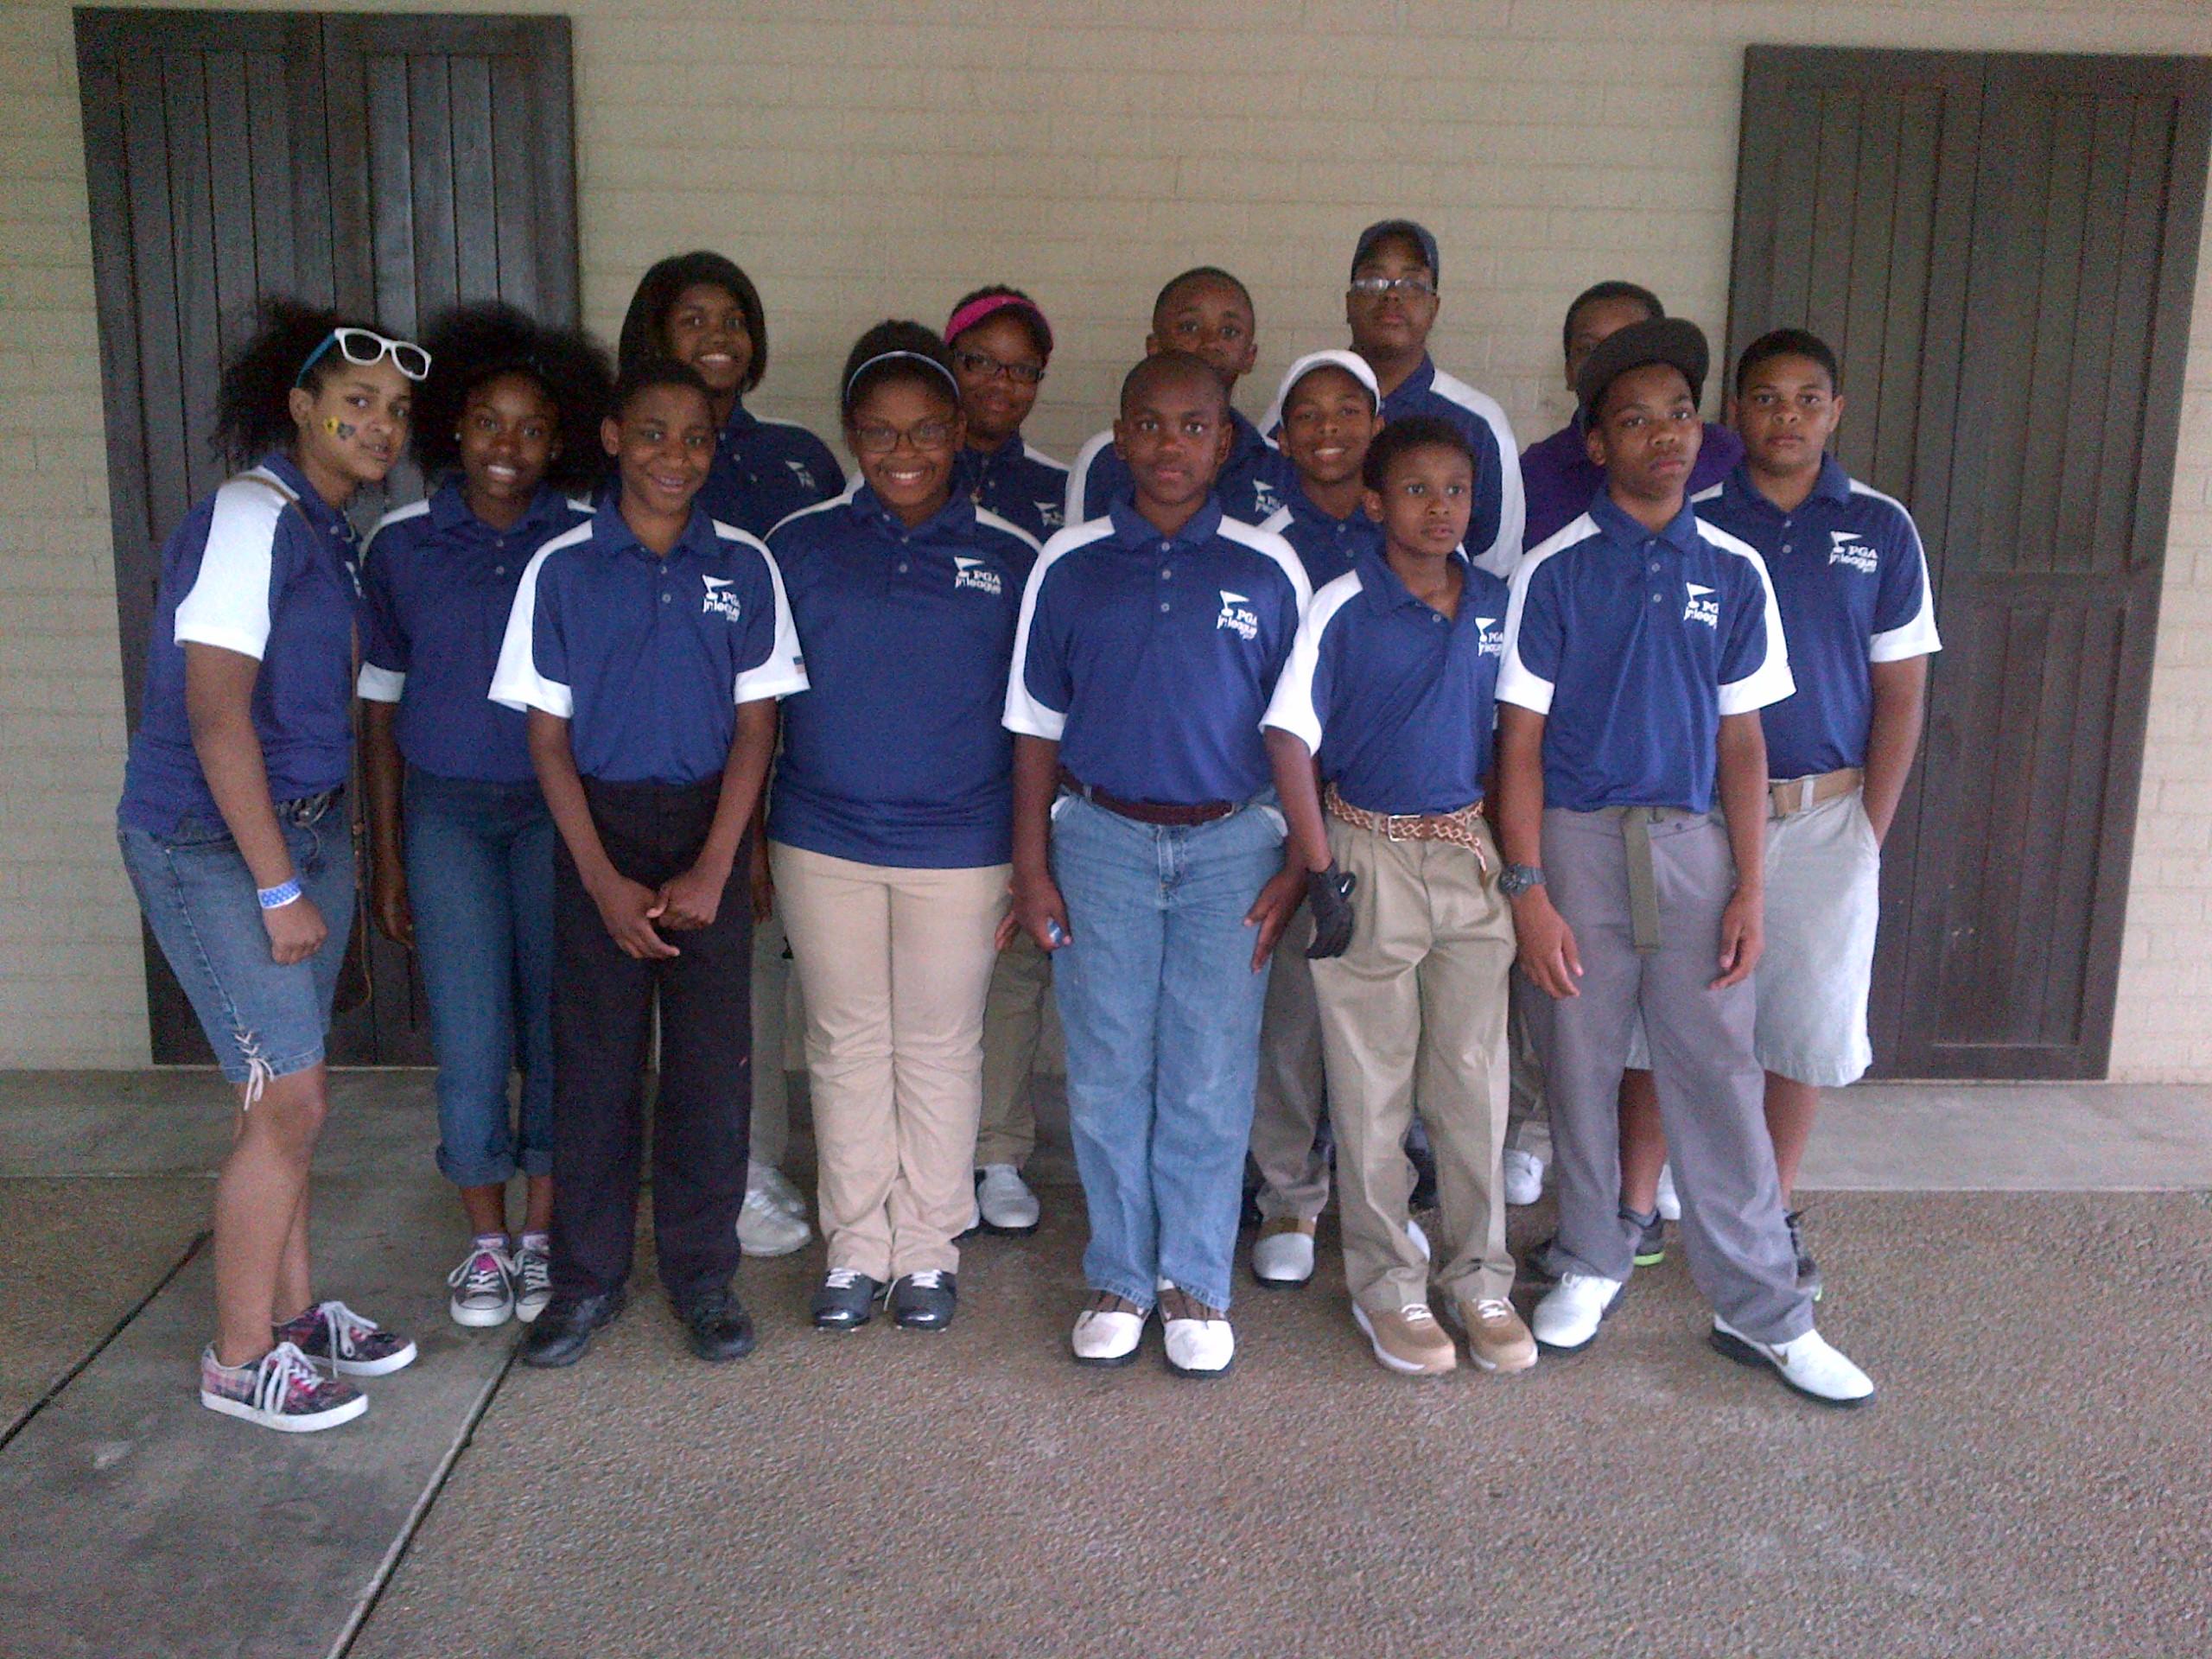 MAM golf program promotes fitness, spiritual growth, fun